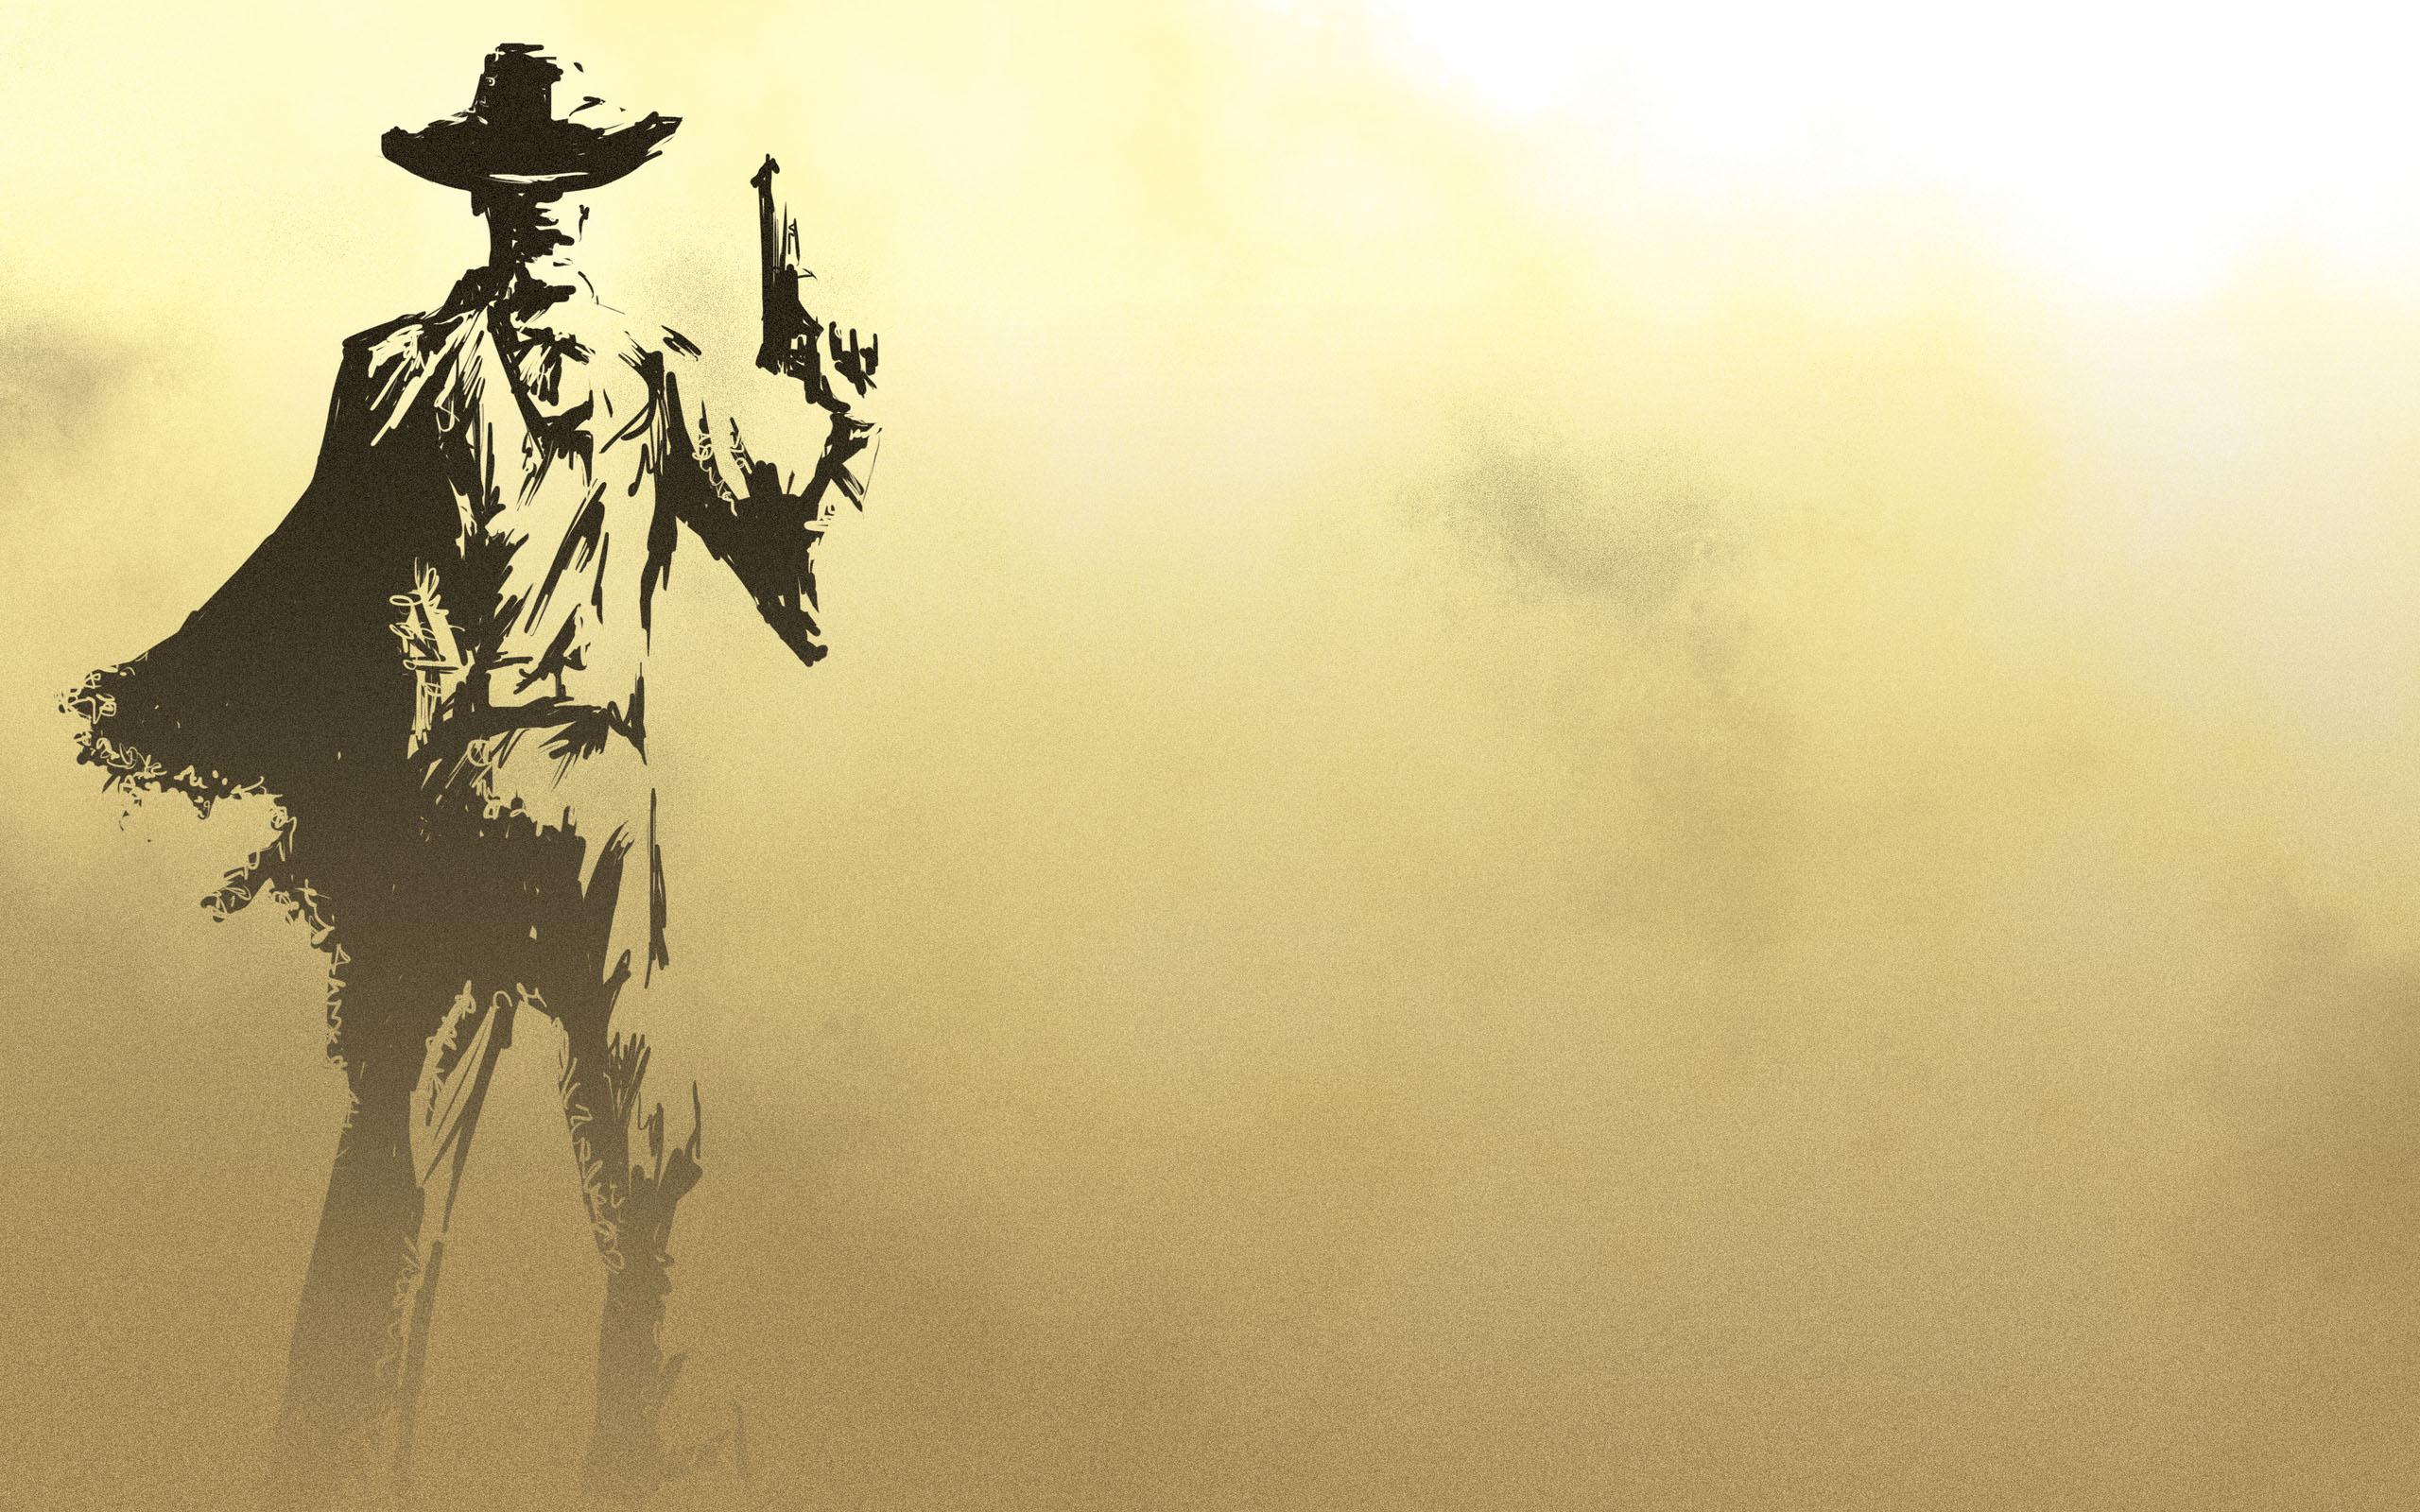 Cowboy Desktop HD Wallpapers 2560x1600